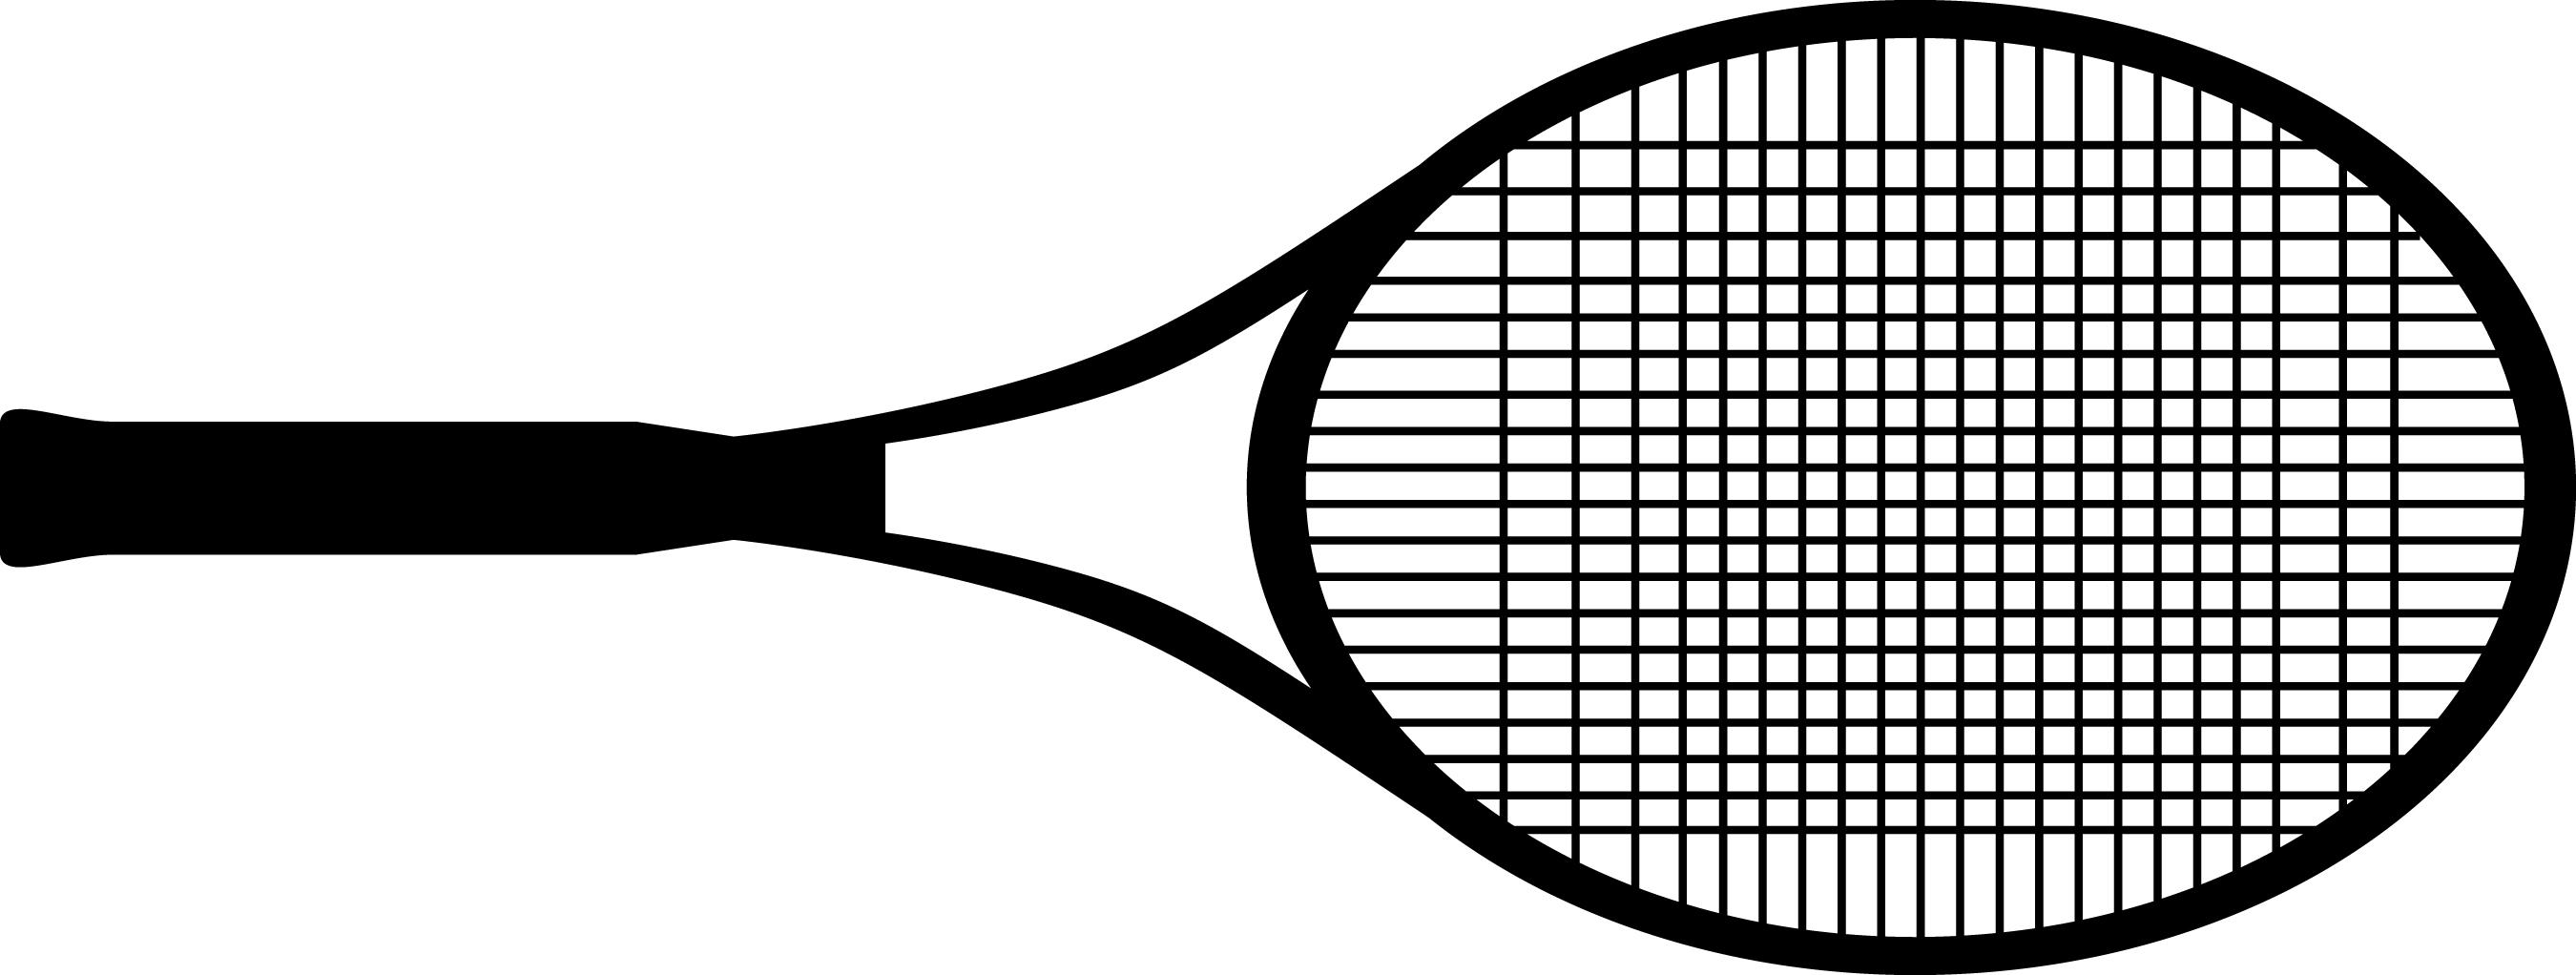 55 tennis racquet clip clipartlook